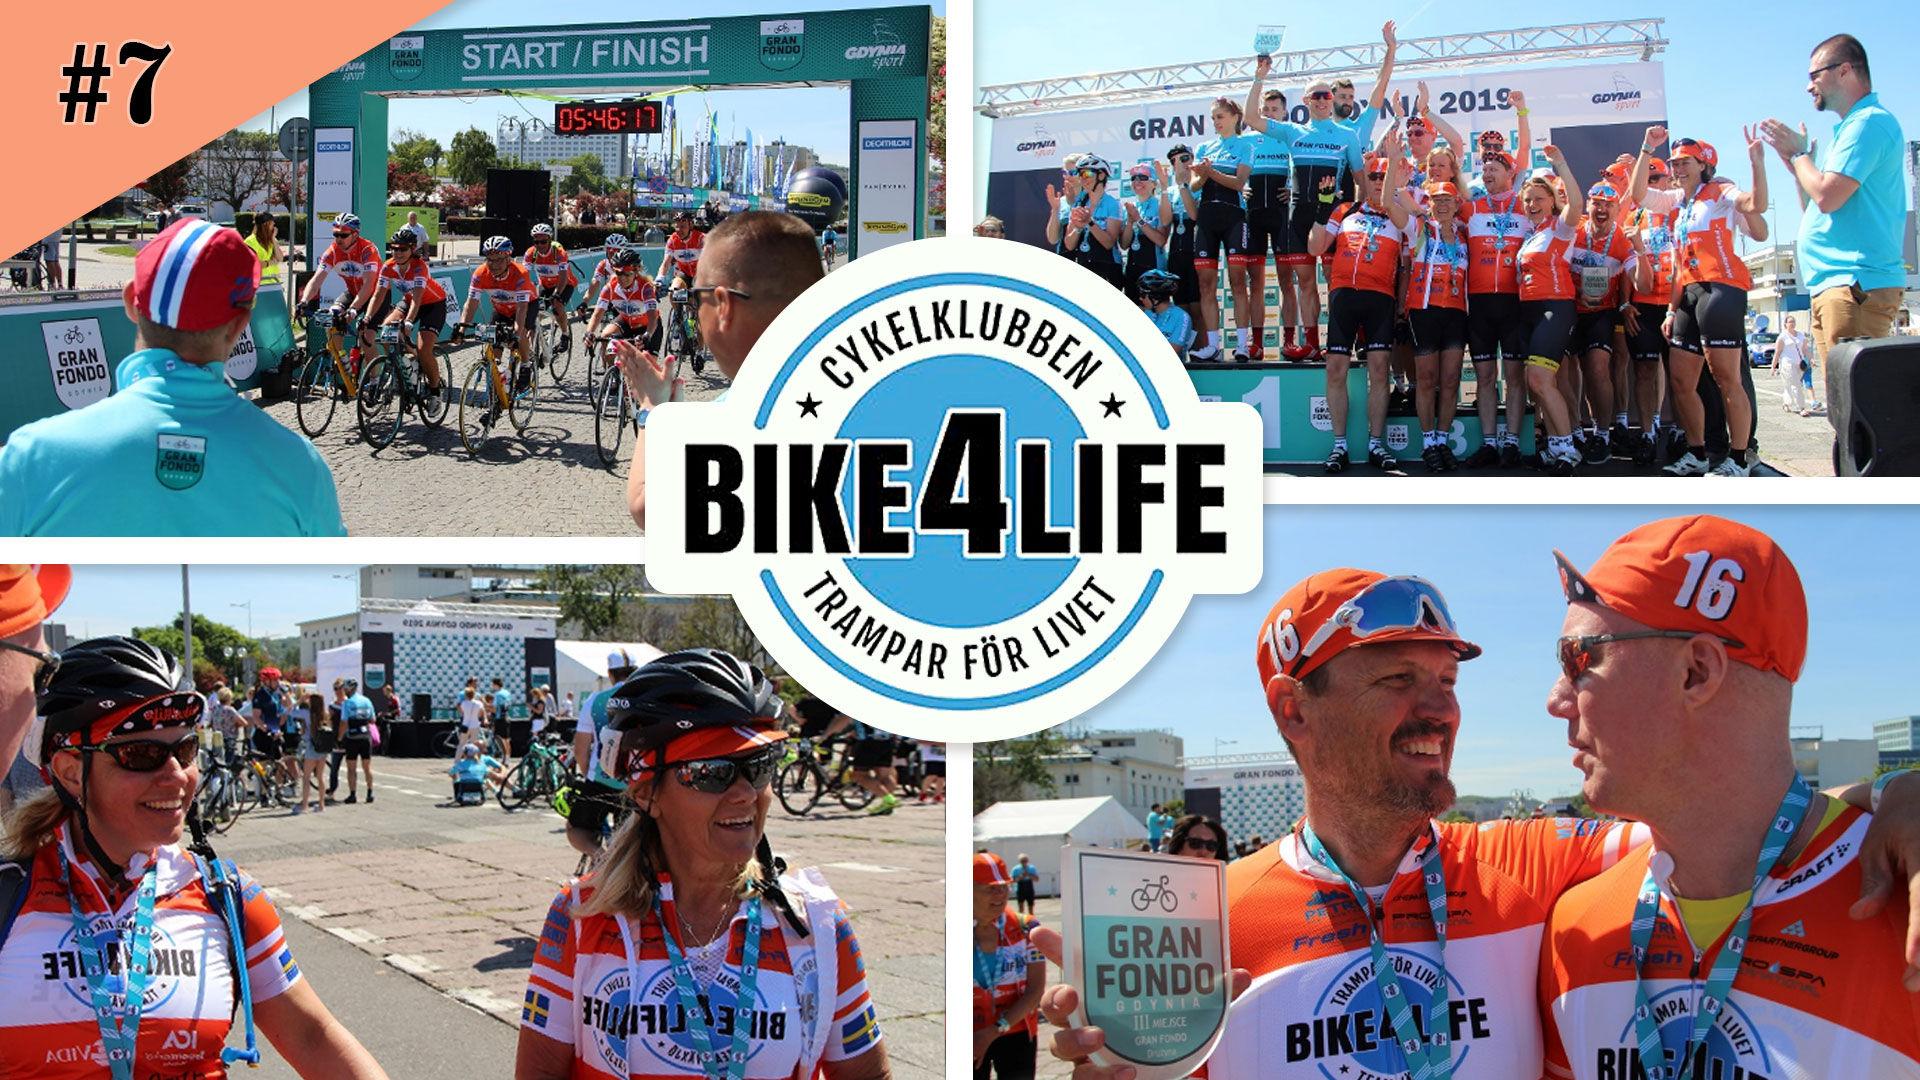 Bike4Life etapp 7